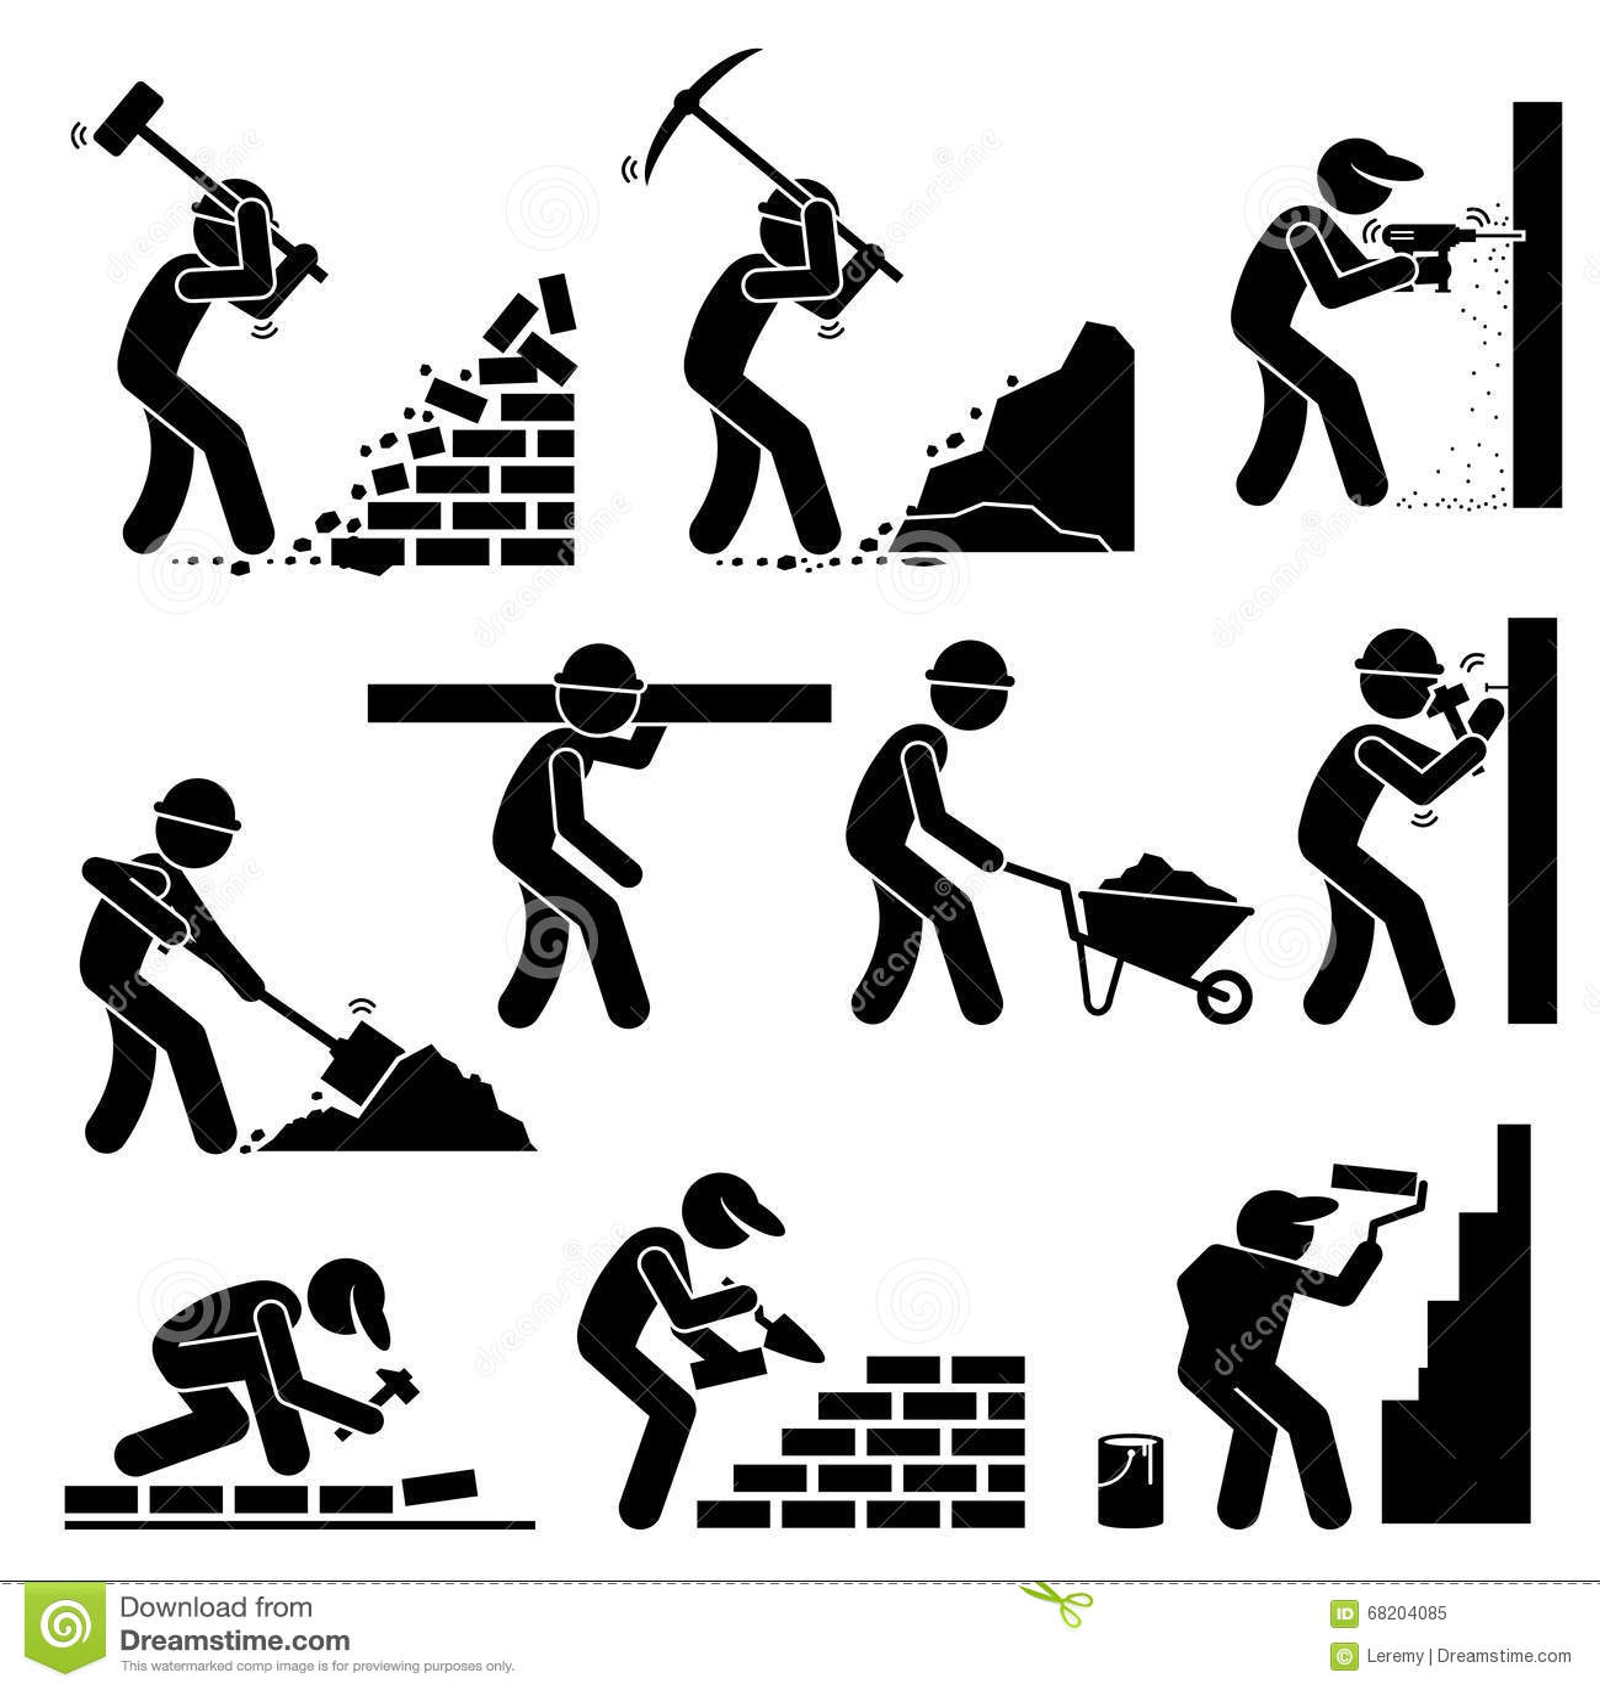 Builders Constructors Workers Building Houses Clipart